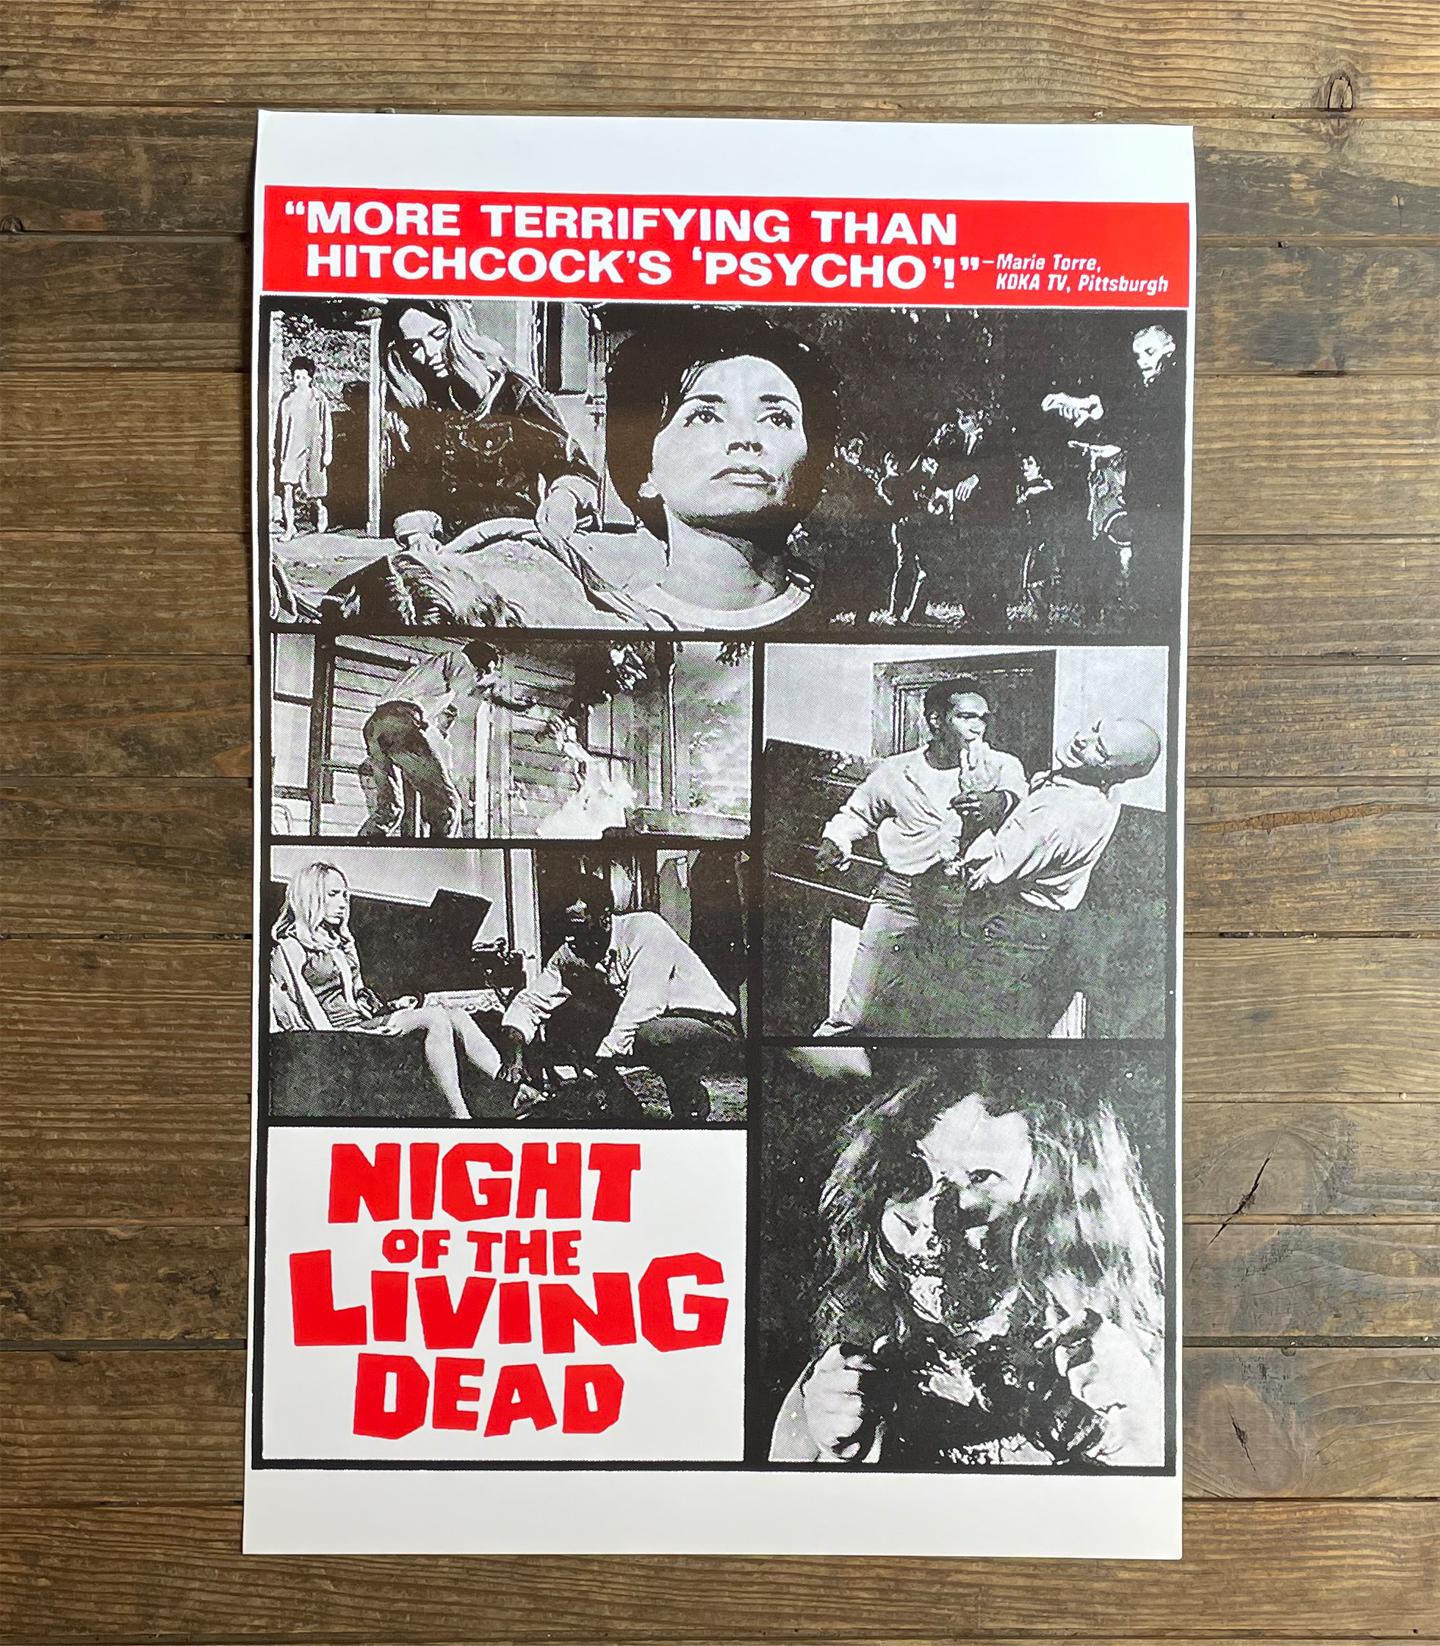 NIGHT OF THE LIVING DEAD ポスター